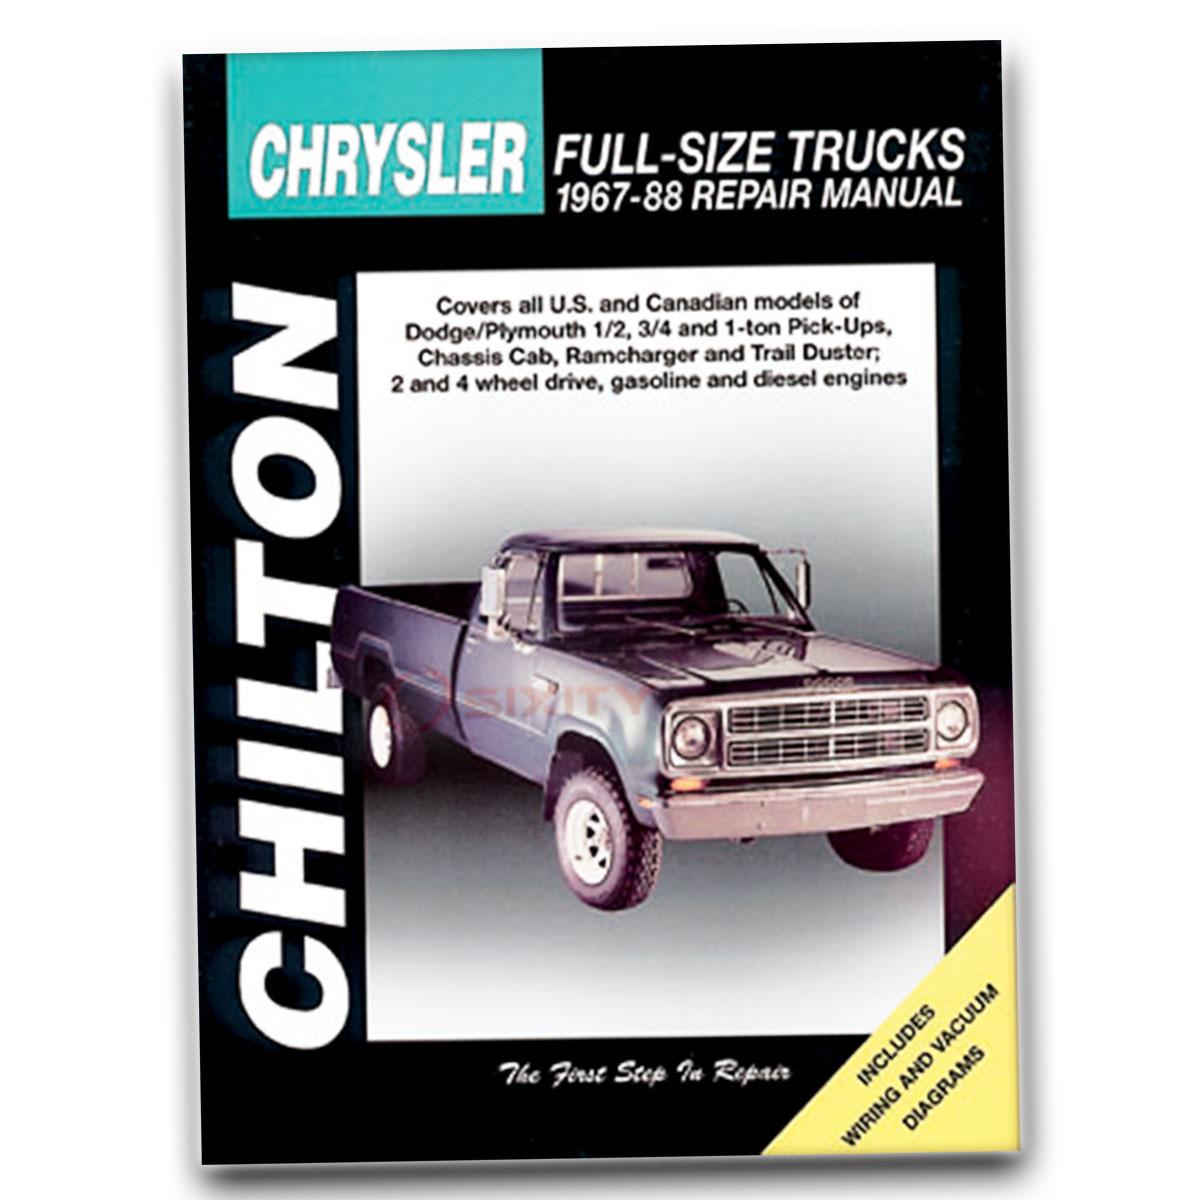 Chilton Repair Manual for Dodge D150 Base Miser Shop Service Garage Book kq